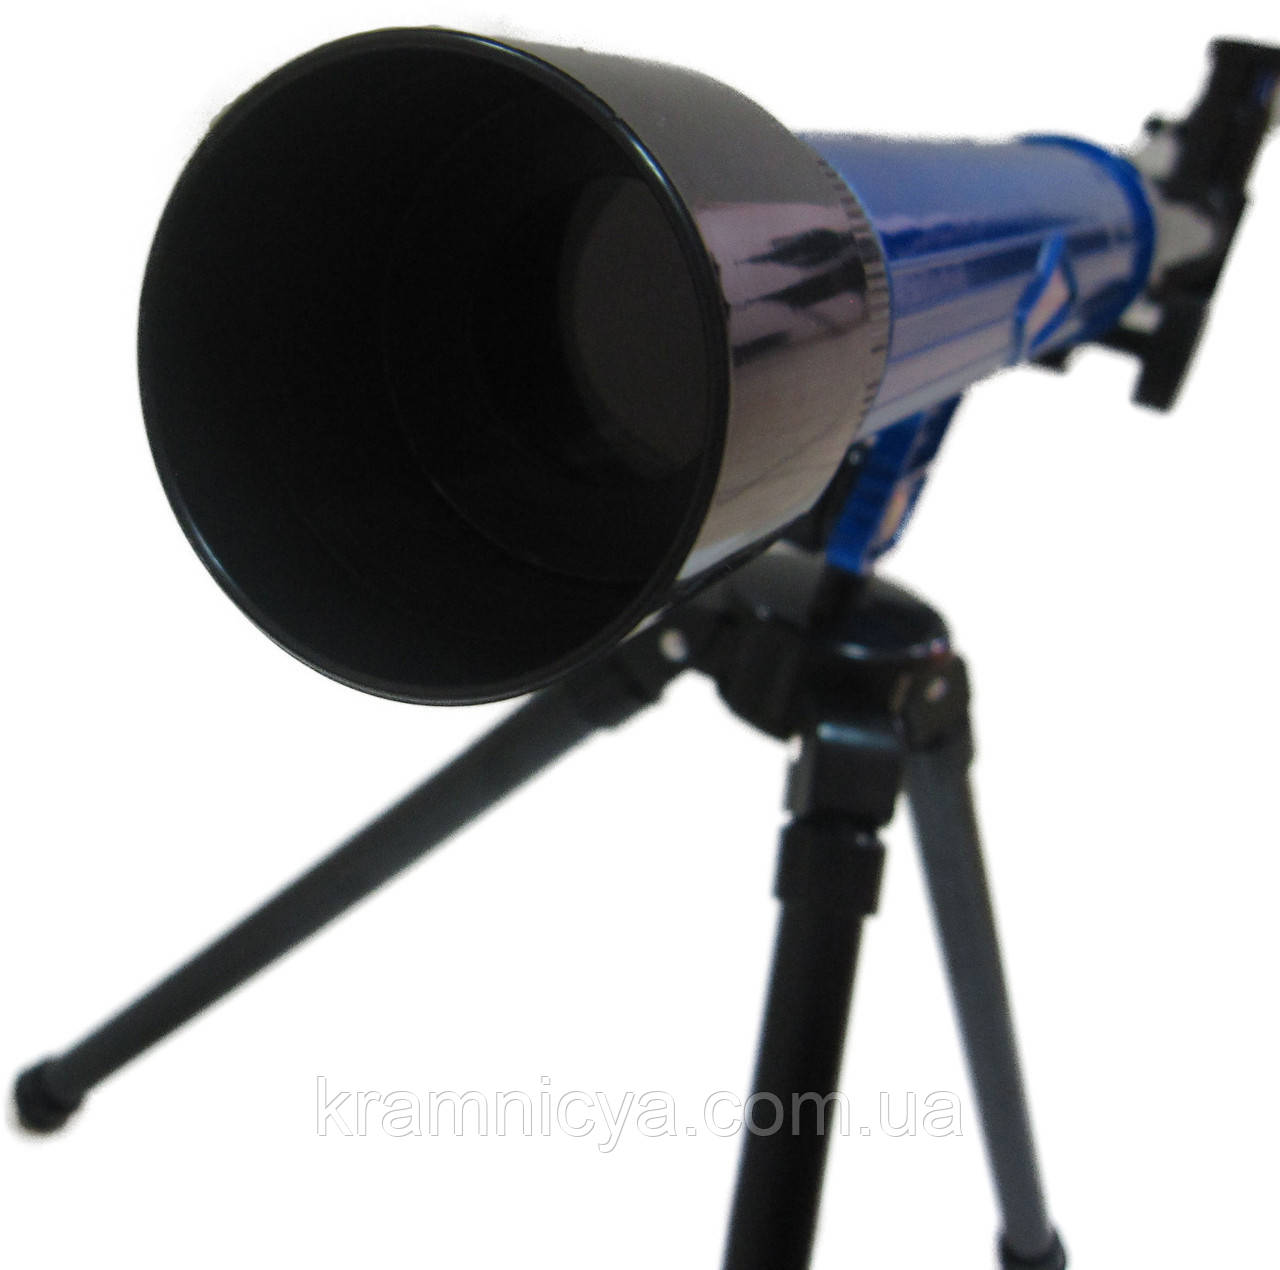 Детский телескоп на треноге, 3 набора линз (С2101)